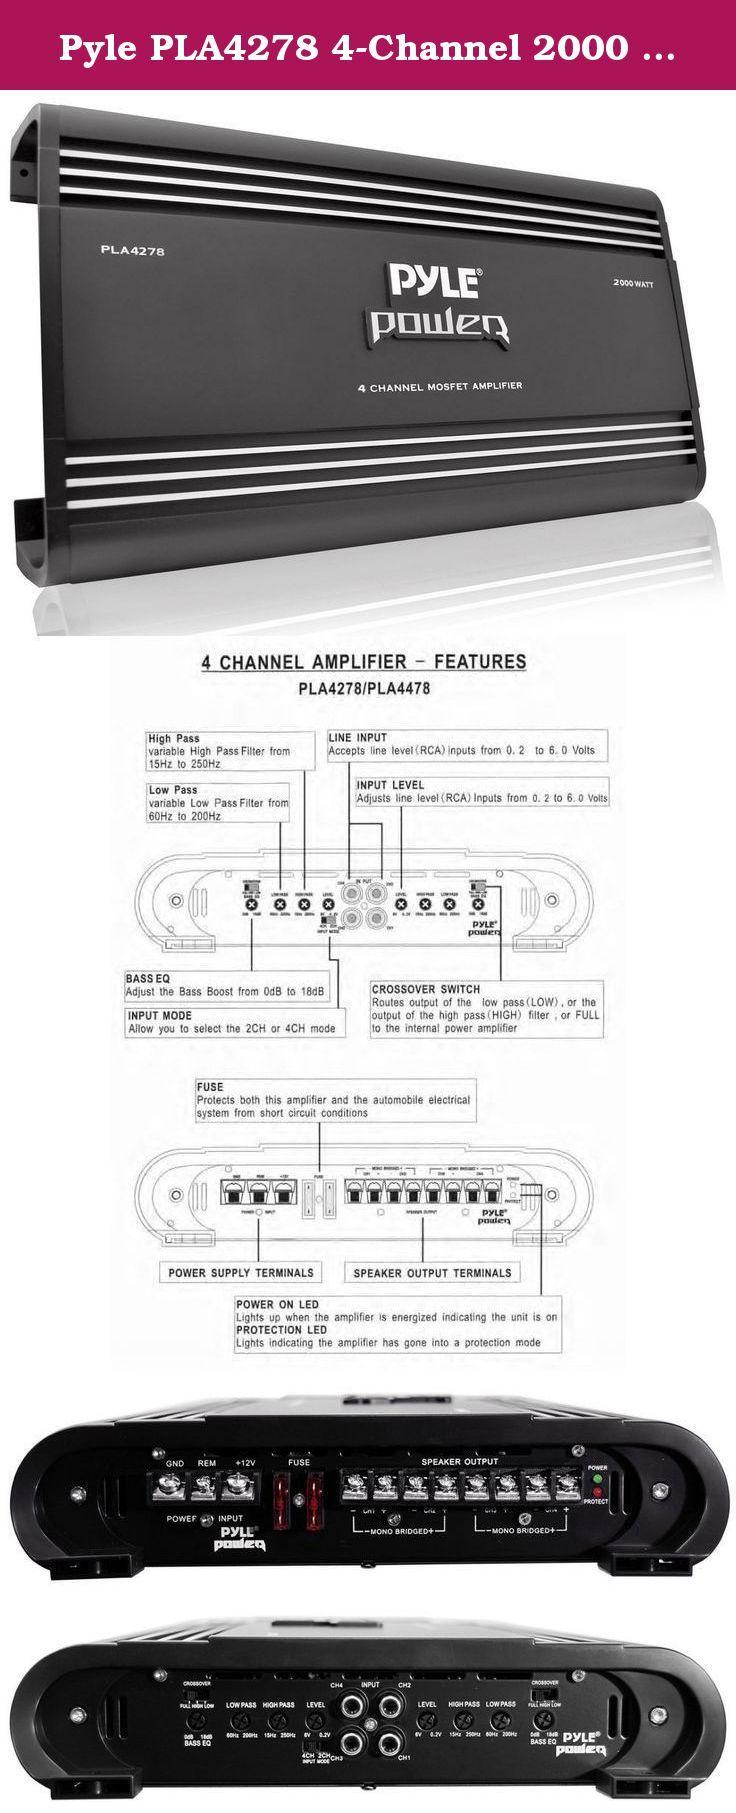 73 2 Channel 2000 Watt Bridgeable Mosfet Amplifier Sound Storm 000watt 24volt Truck Bus Rv Pyle Pla4278 4 When Power Isnt